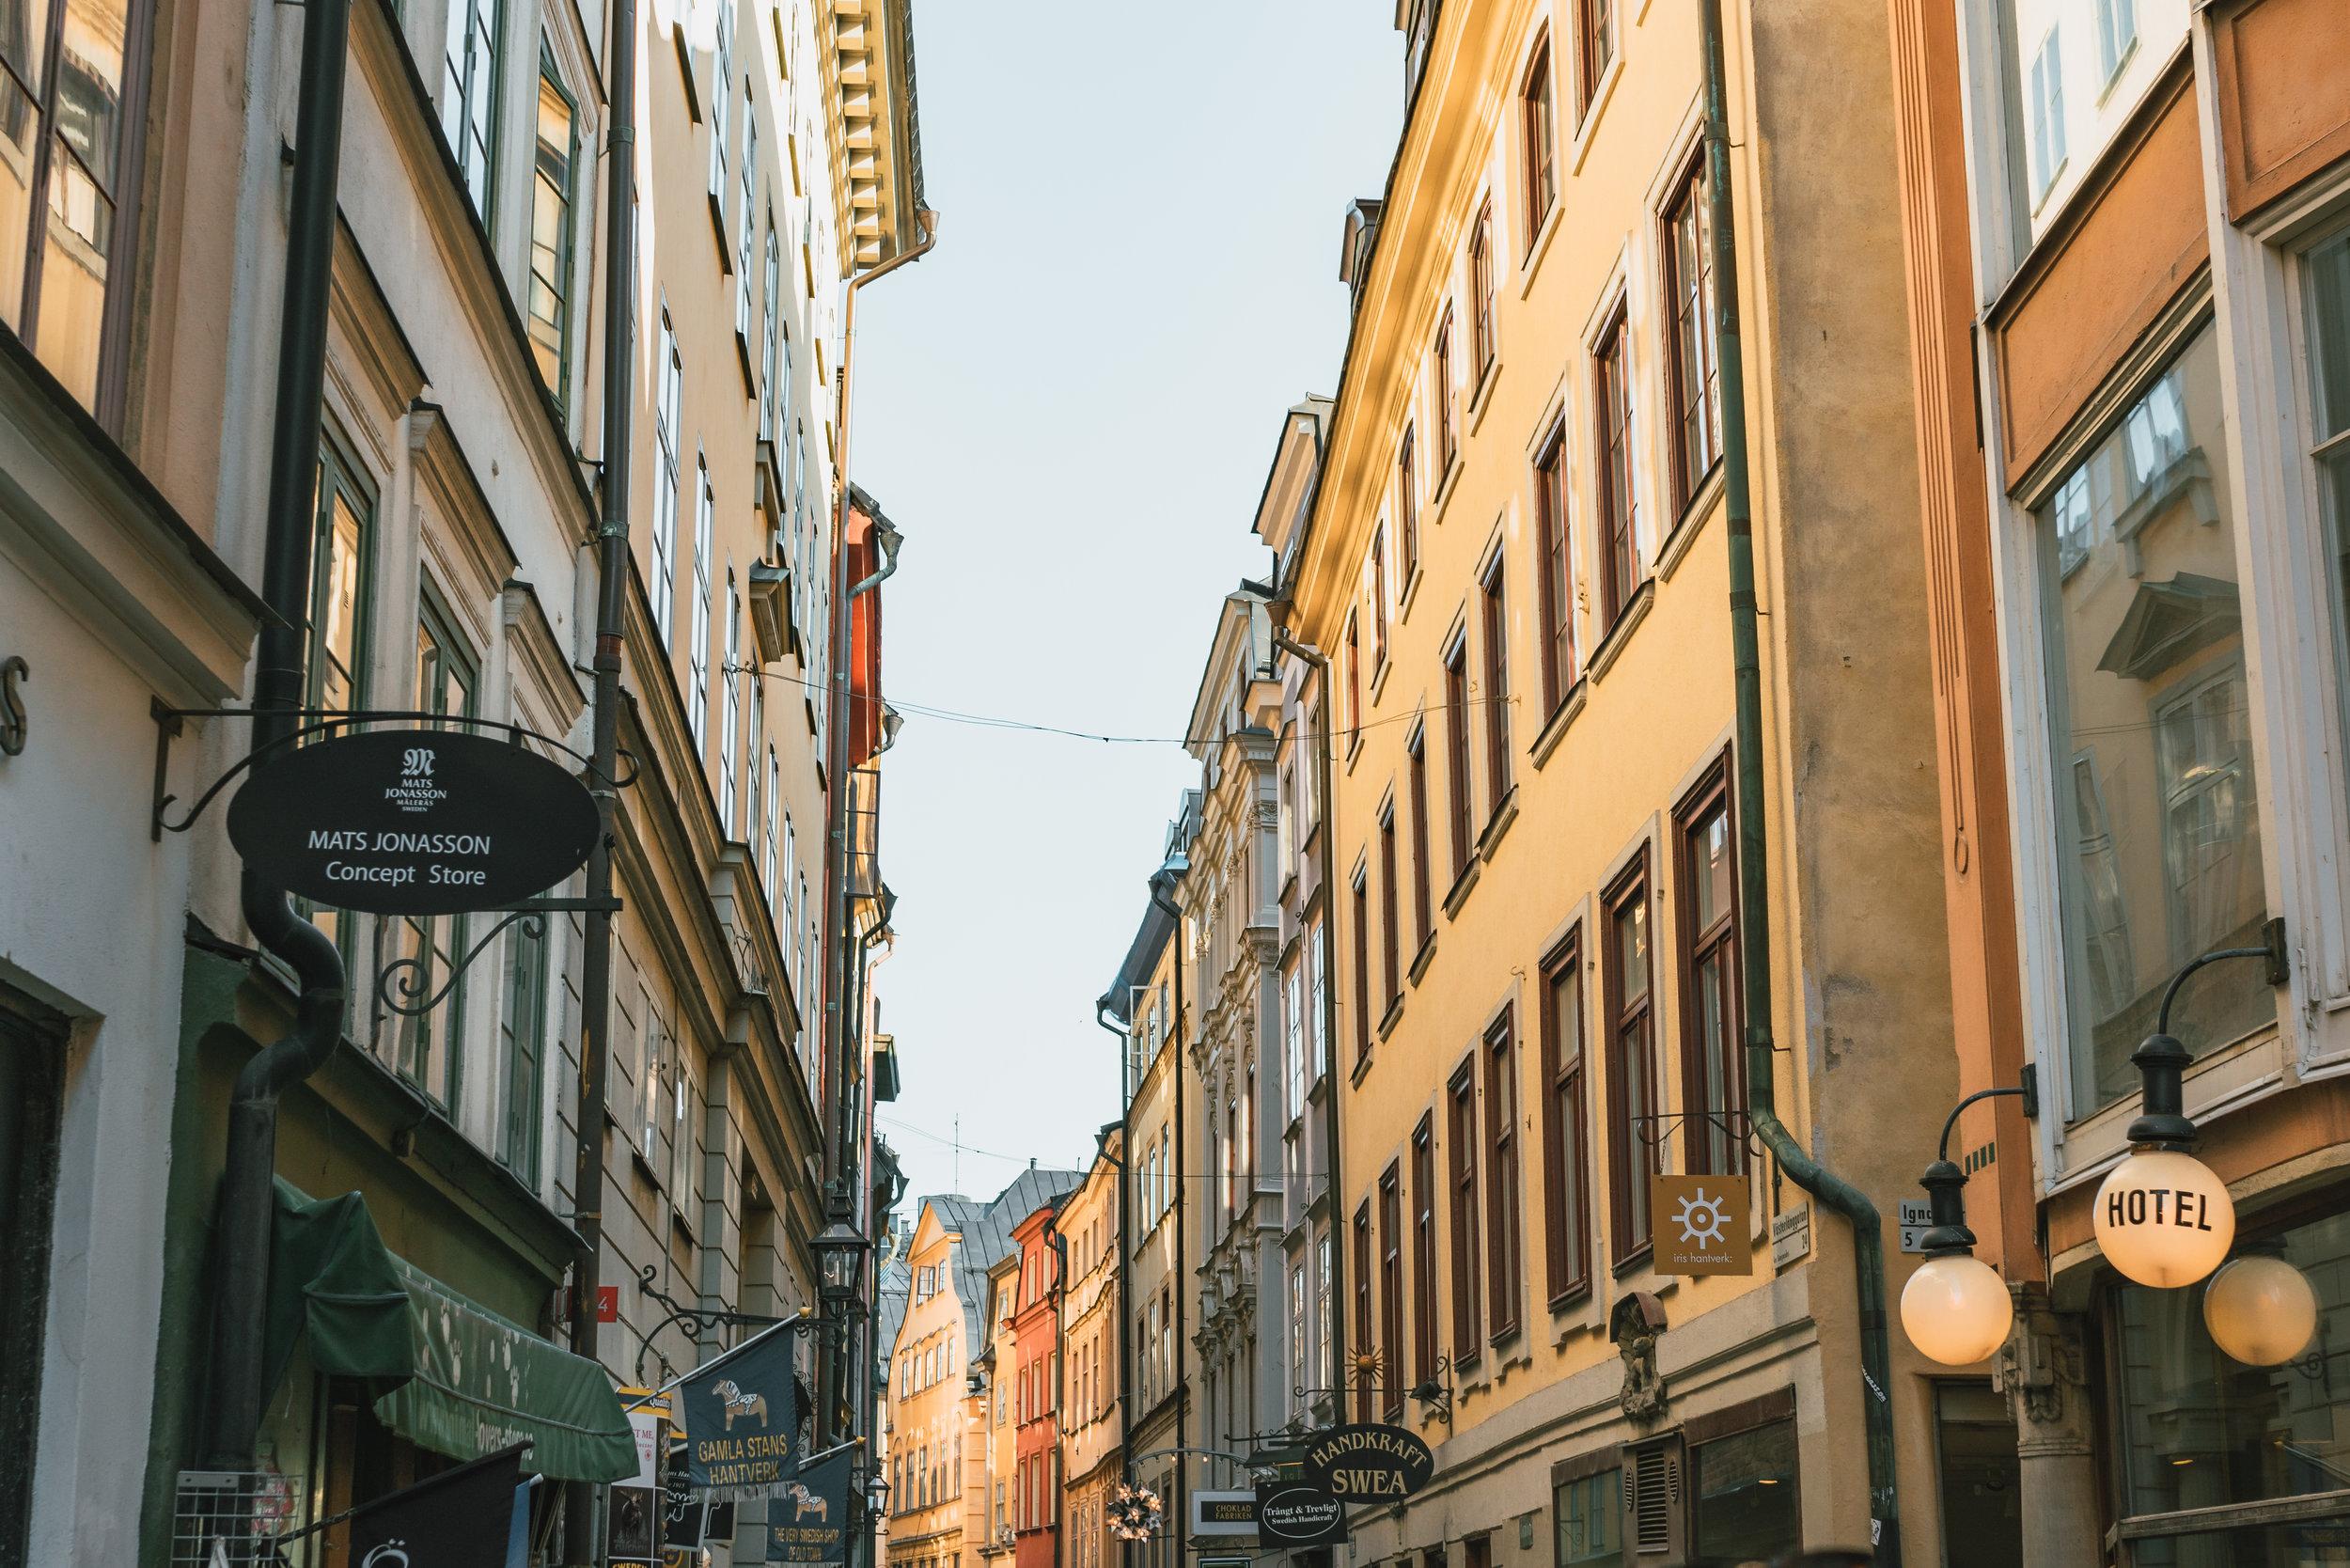 gamla stan+stockholm+old town